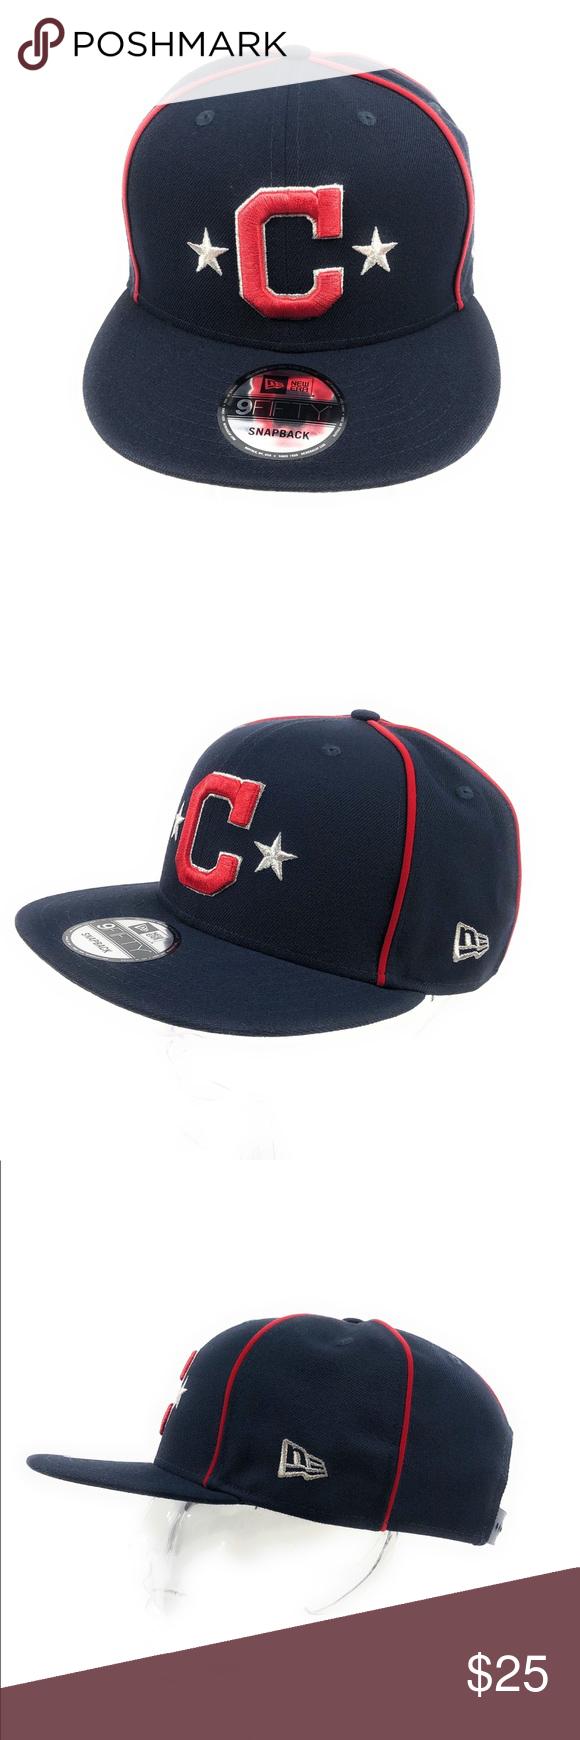 New Era 9fifty Cleveland Indians Mlb Snapback Hat Nwt New Era Baseball Hats New Era 59fifty